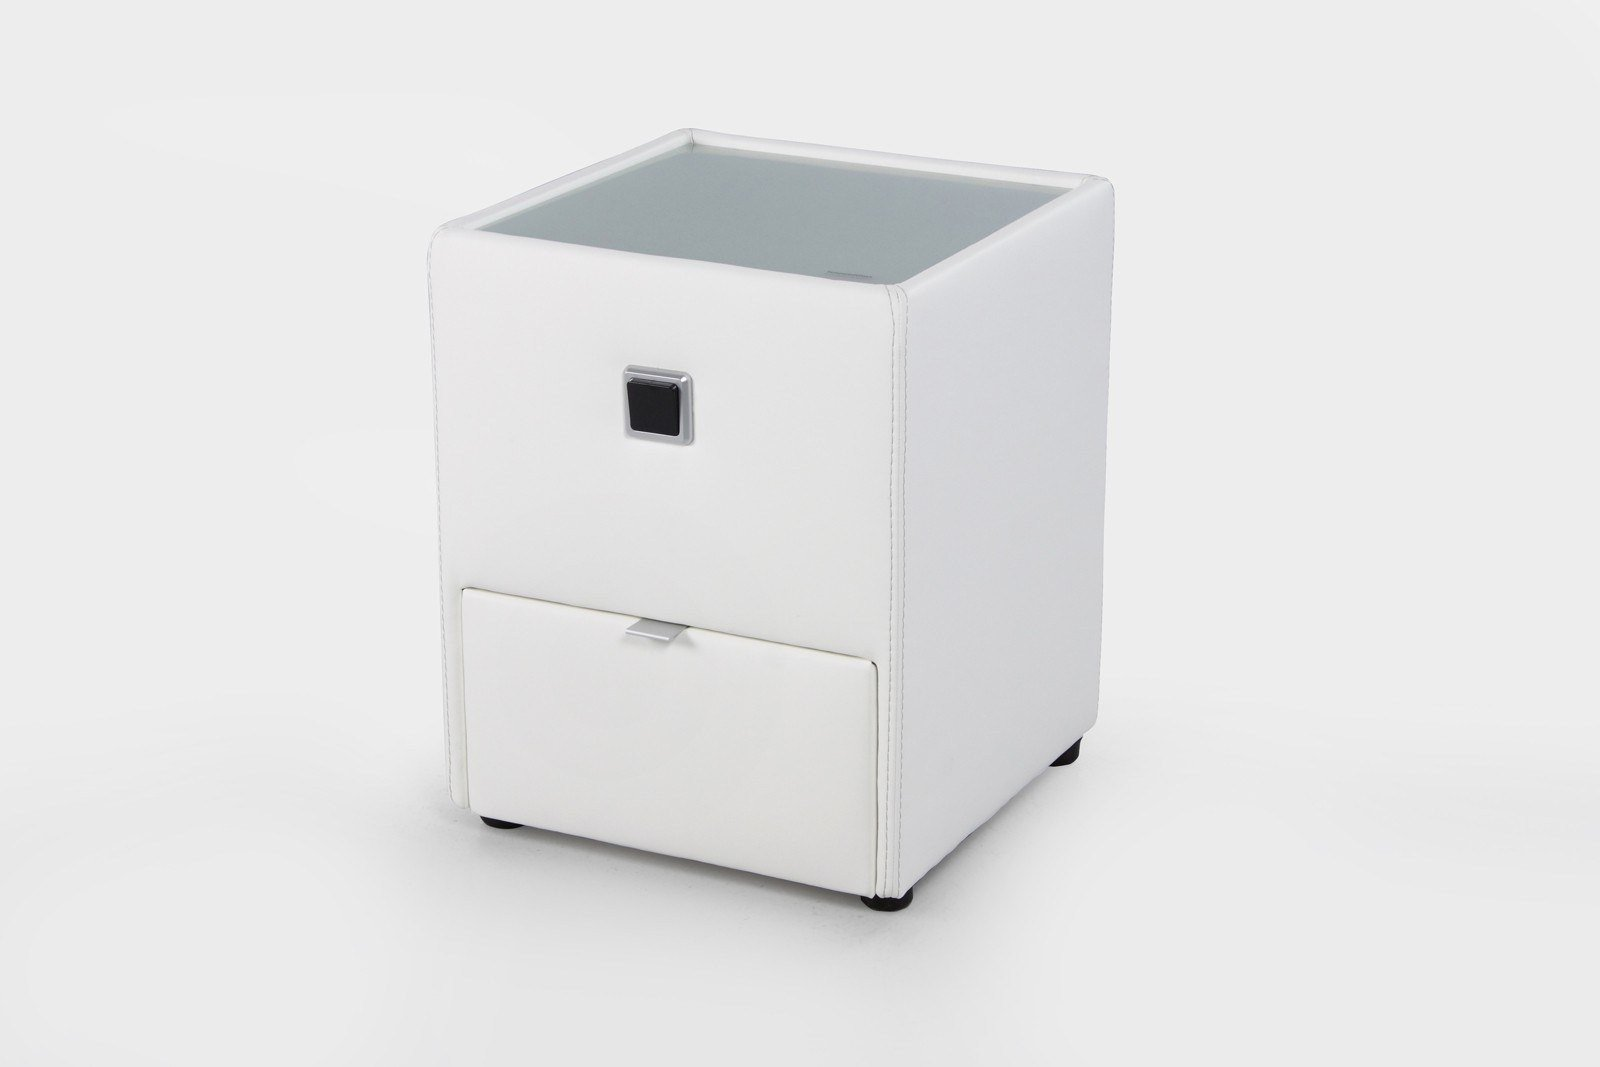 jockenh fer olbia boxspringbett in wei anthrazit m bel letz ihr online shop. Black Bedroom Furniture Sets. Home Design Ideas